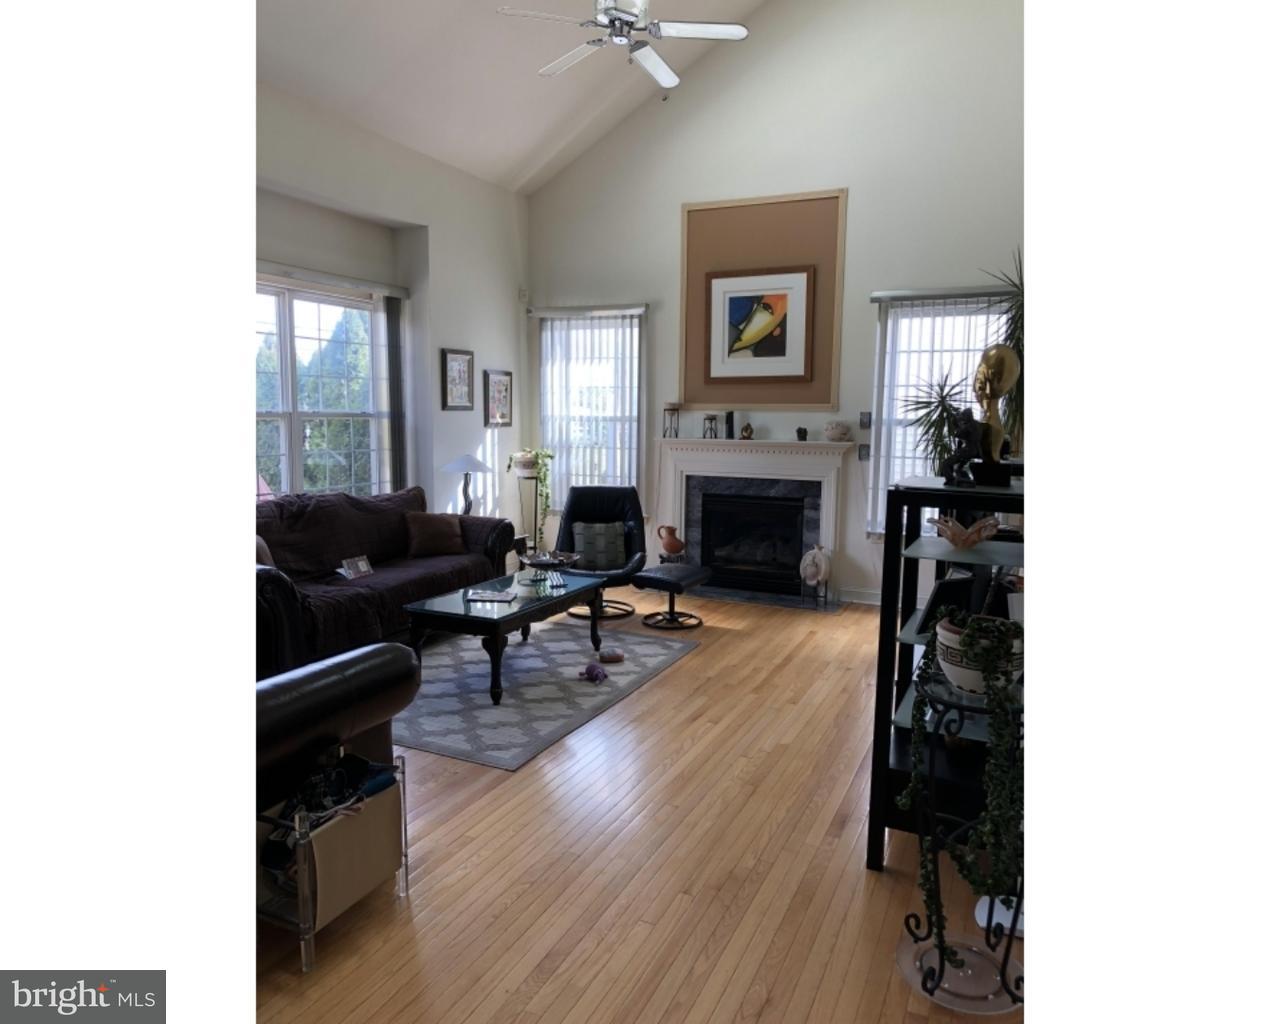 2375 OXFORDSHIRE RD, FURLONG - Listed at $586,000, FURLONG